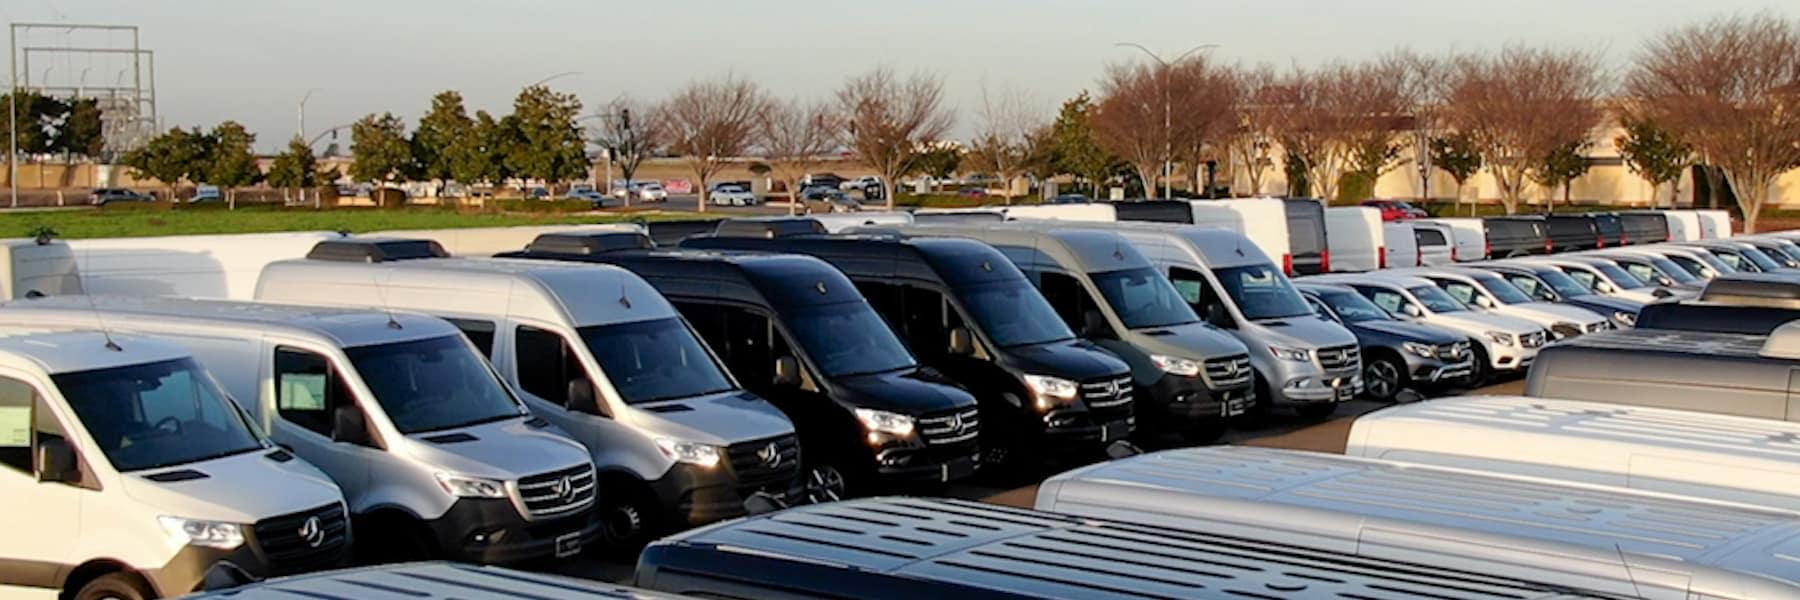 Inventory vans lot